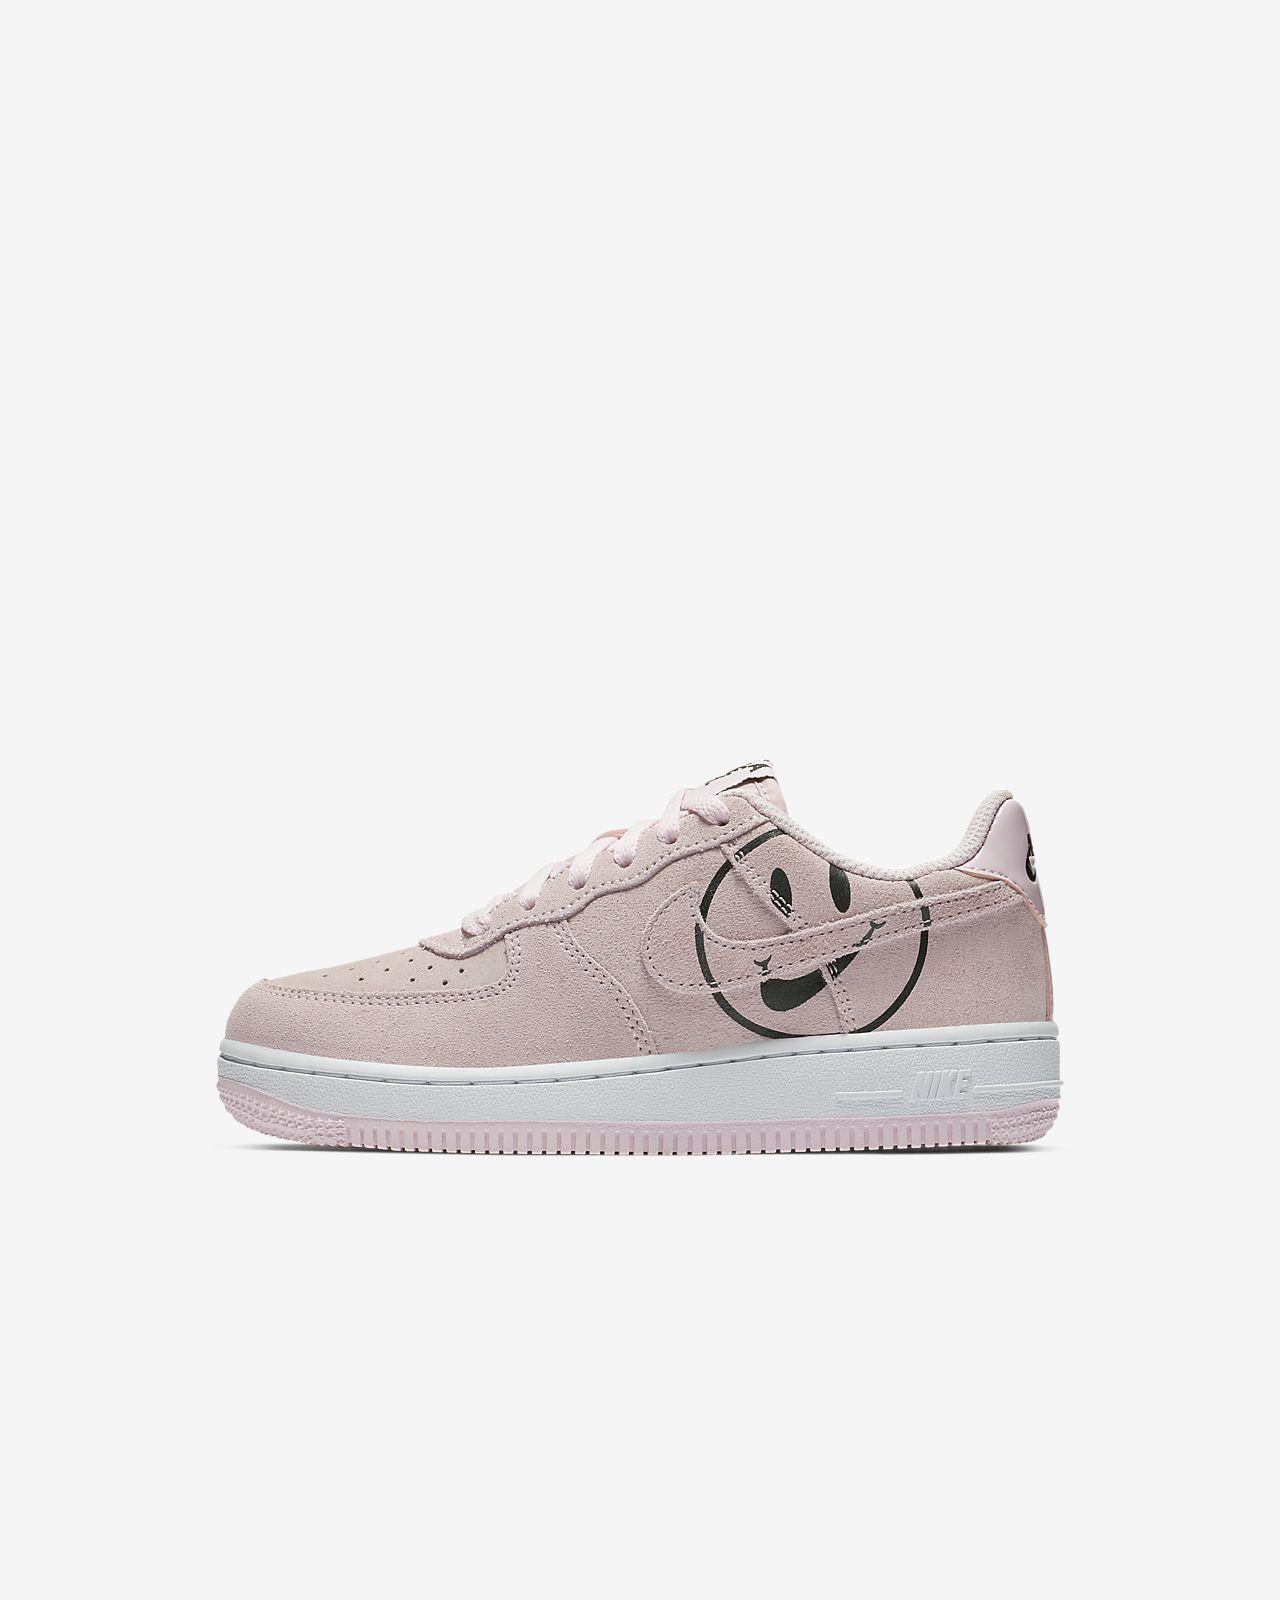 0de3c22c9d859 Nike Force 1 LV8 2 Younger Kids  Shoe. Nike.com IE